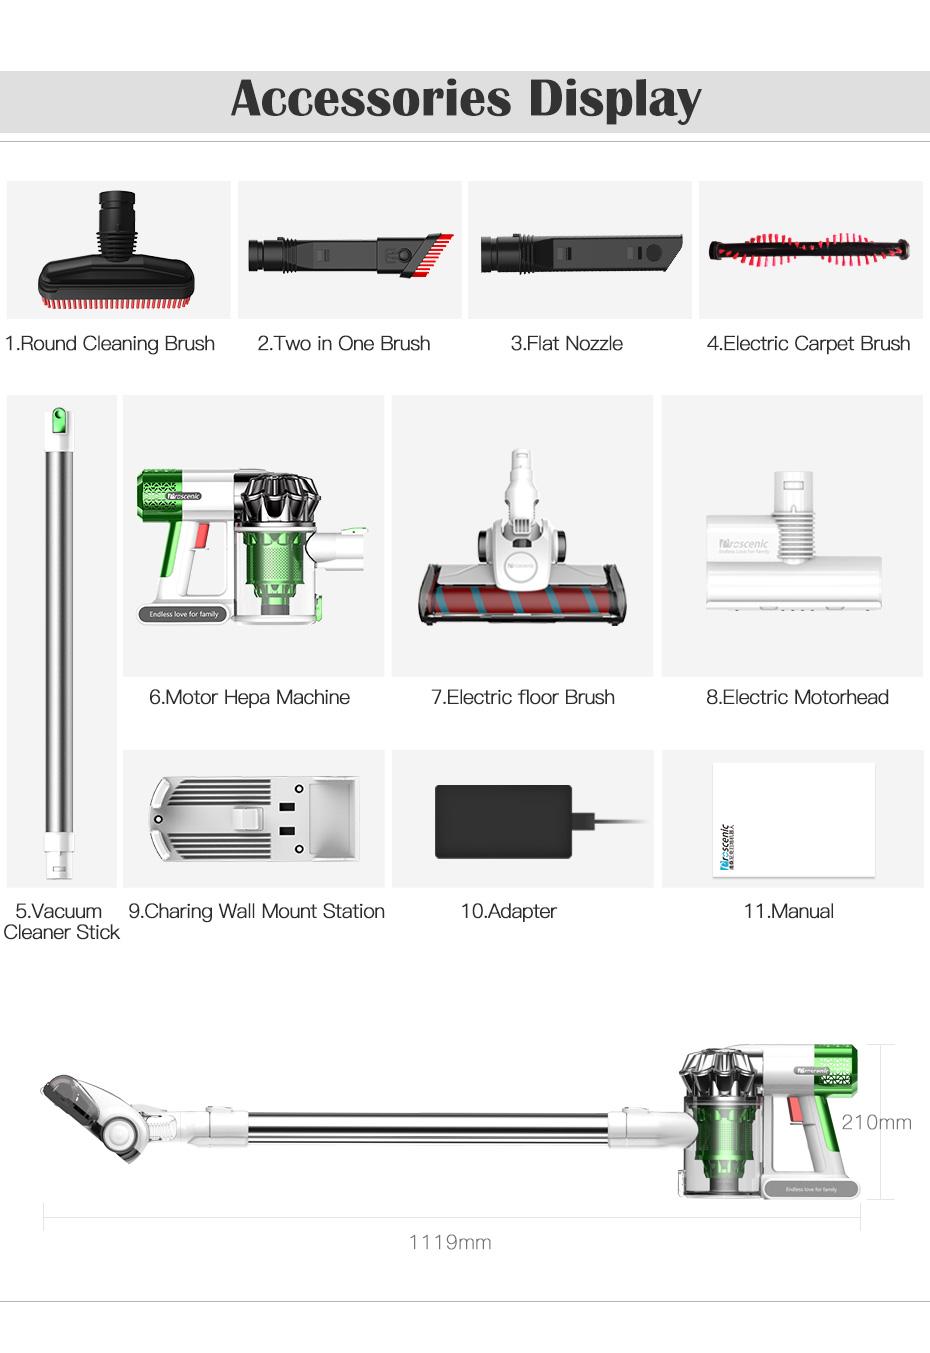 proscenic p9 aspirateur balai sans fil sans sac voiture vertical nettoyeur 200w ebay